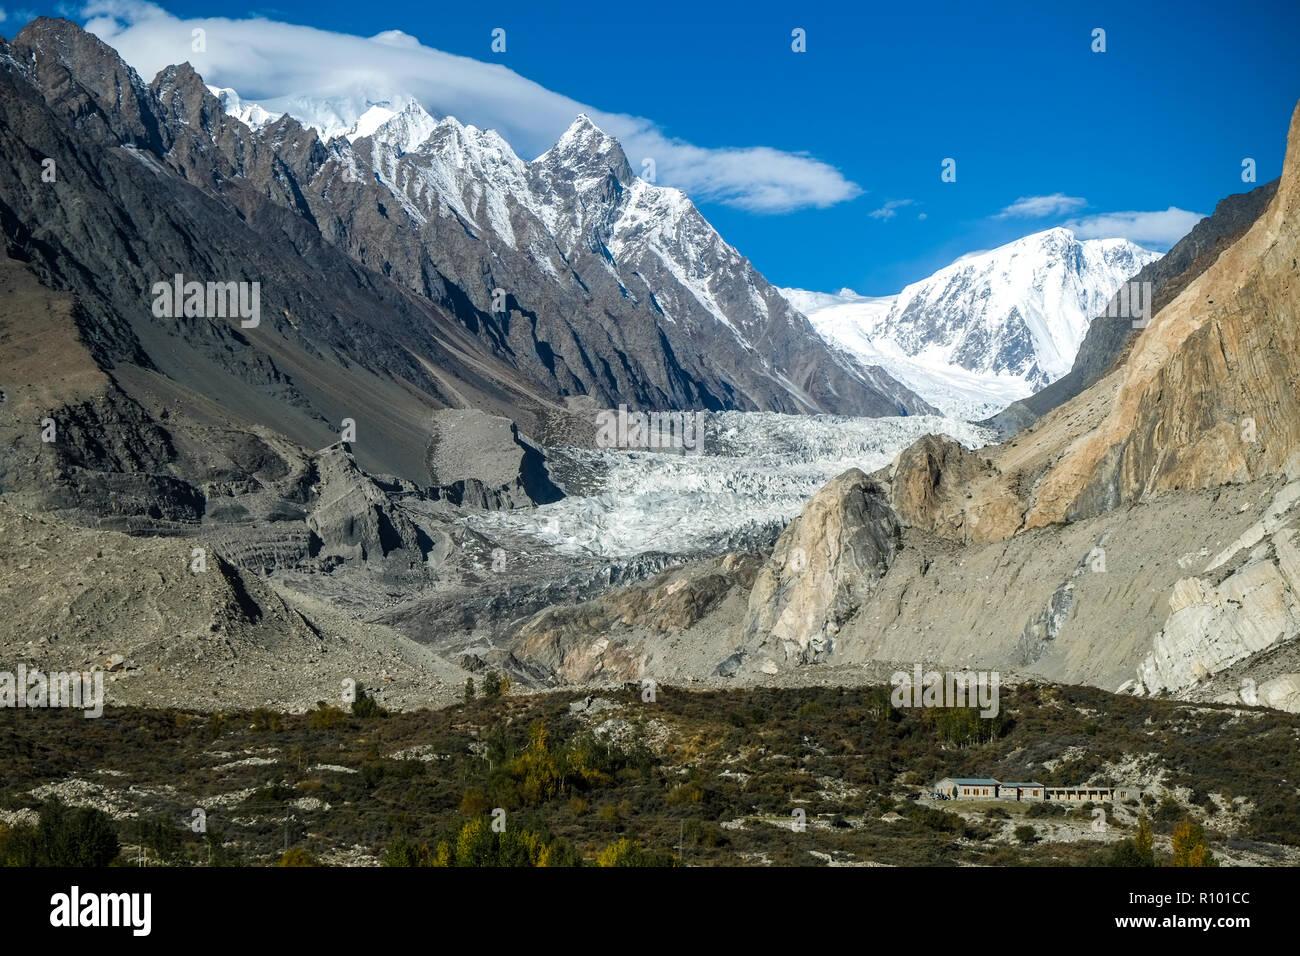 Passu glacier surrounded by mountains in Karakoram range. Gilgit-Baltistan, Pakistan. - Stock Image